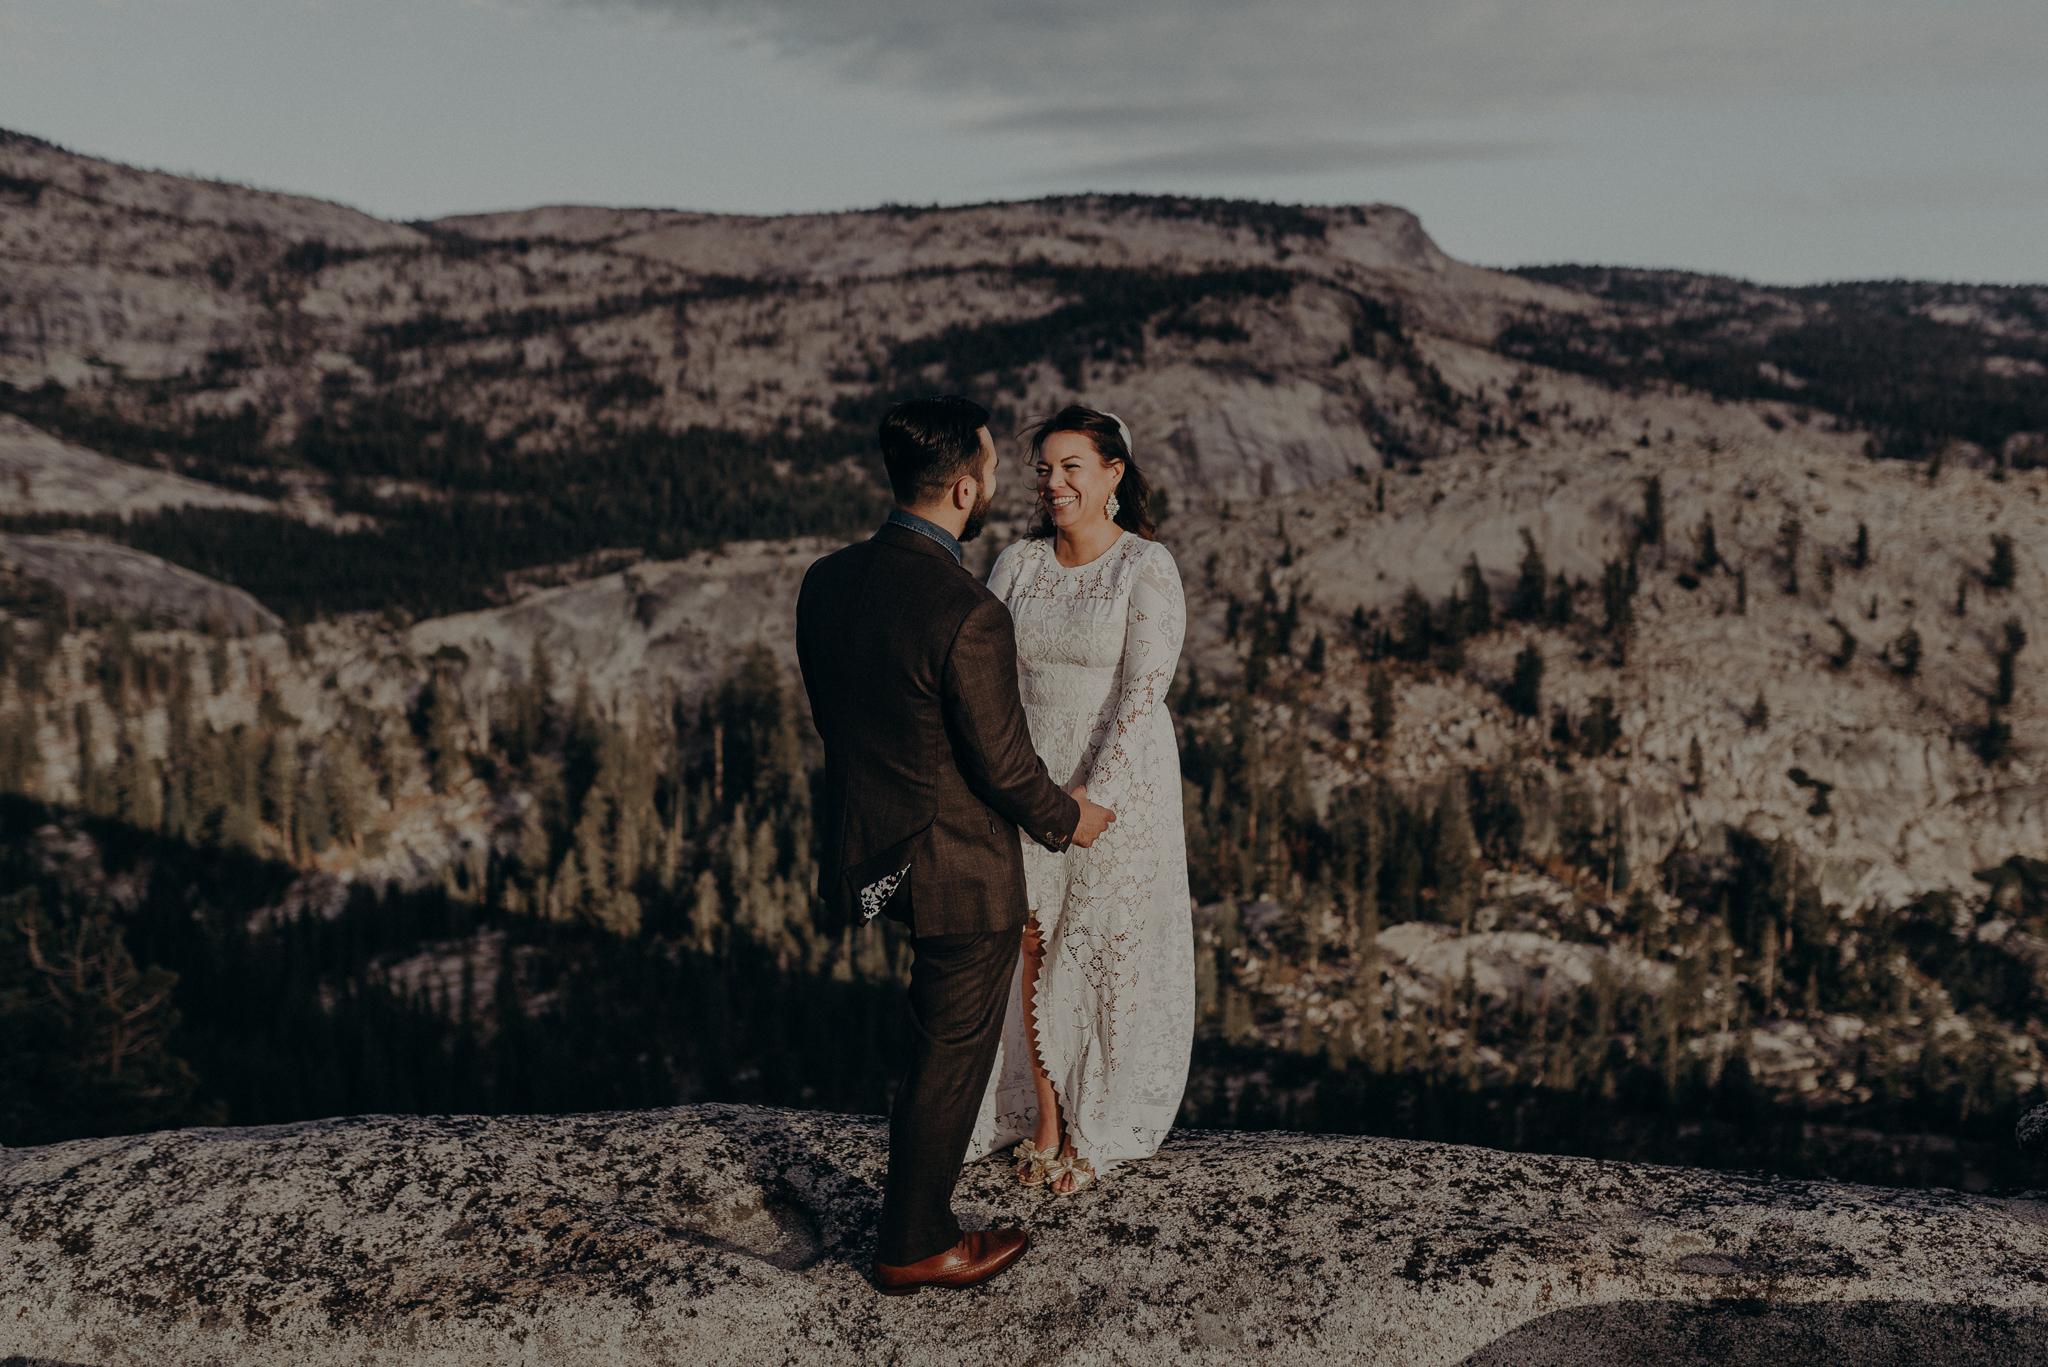 Yosemite Elopement Photographer - Evergreen Lodge Wedding Photographer - IsaiahAndTaylor.com-025.jpg